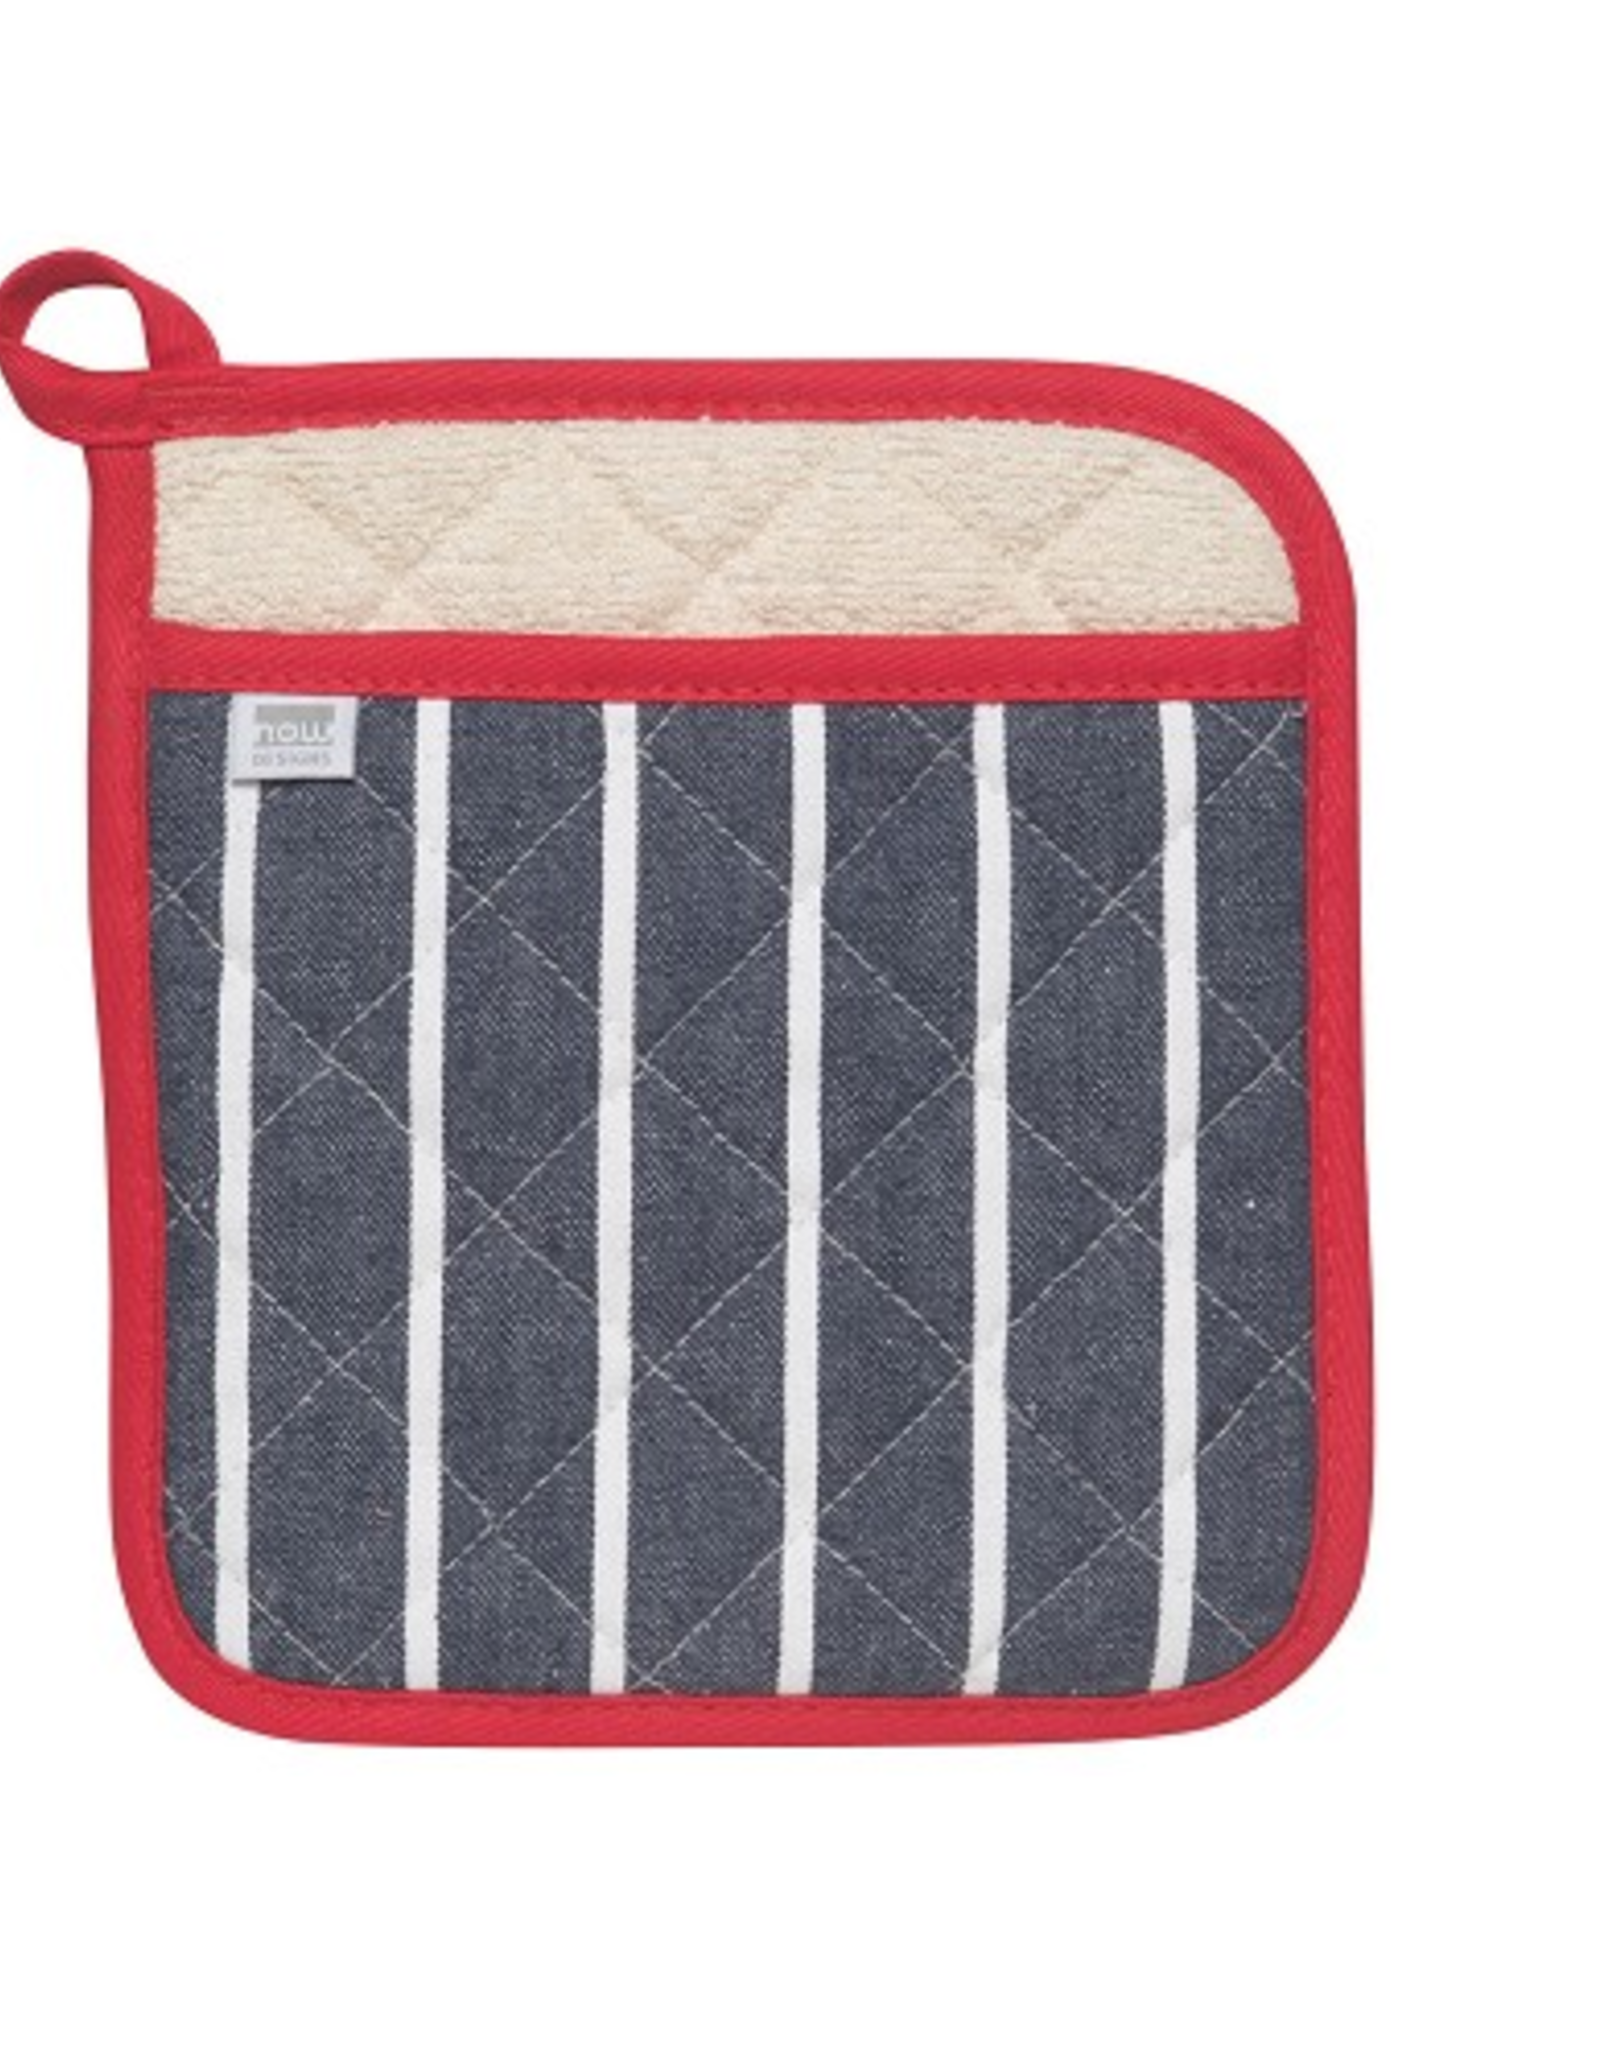 Now Designs Potholder, Navy Butcher Stripe